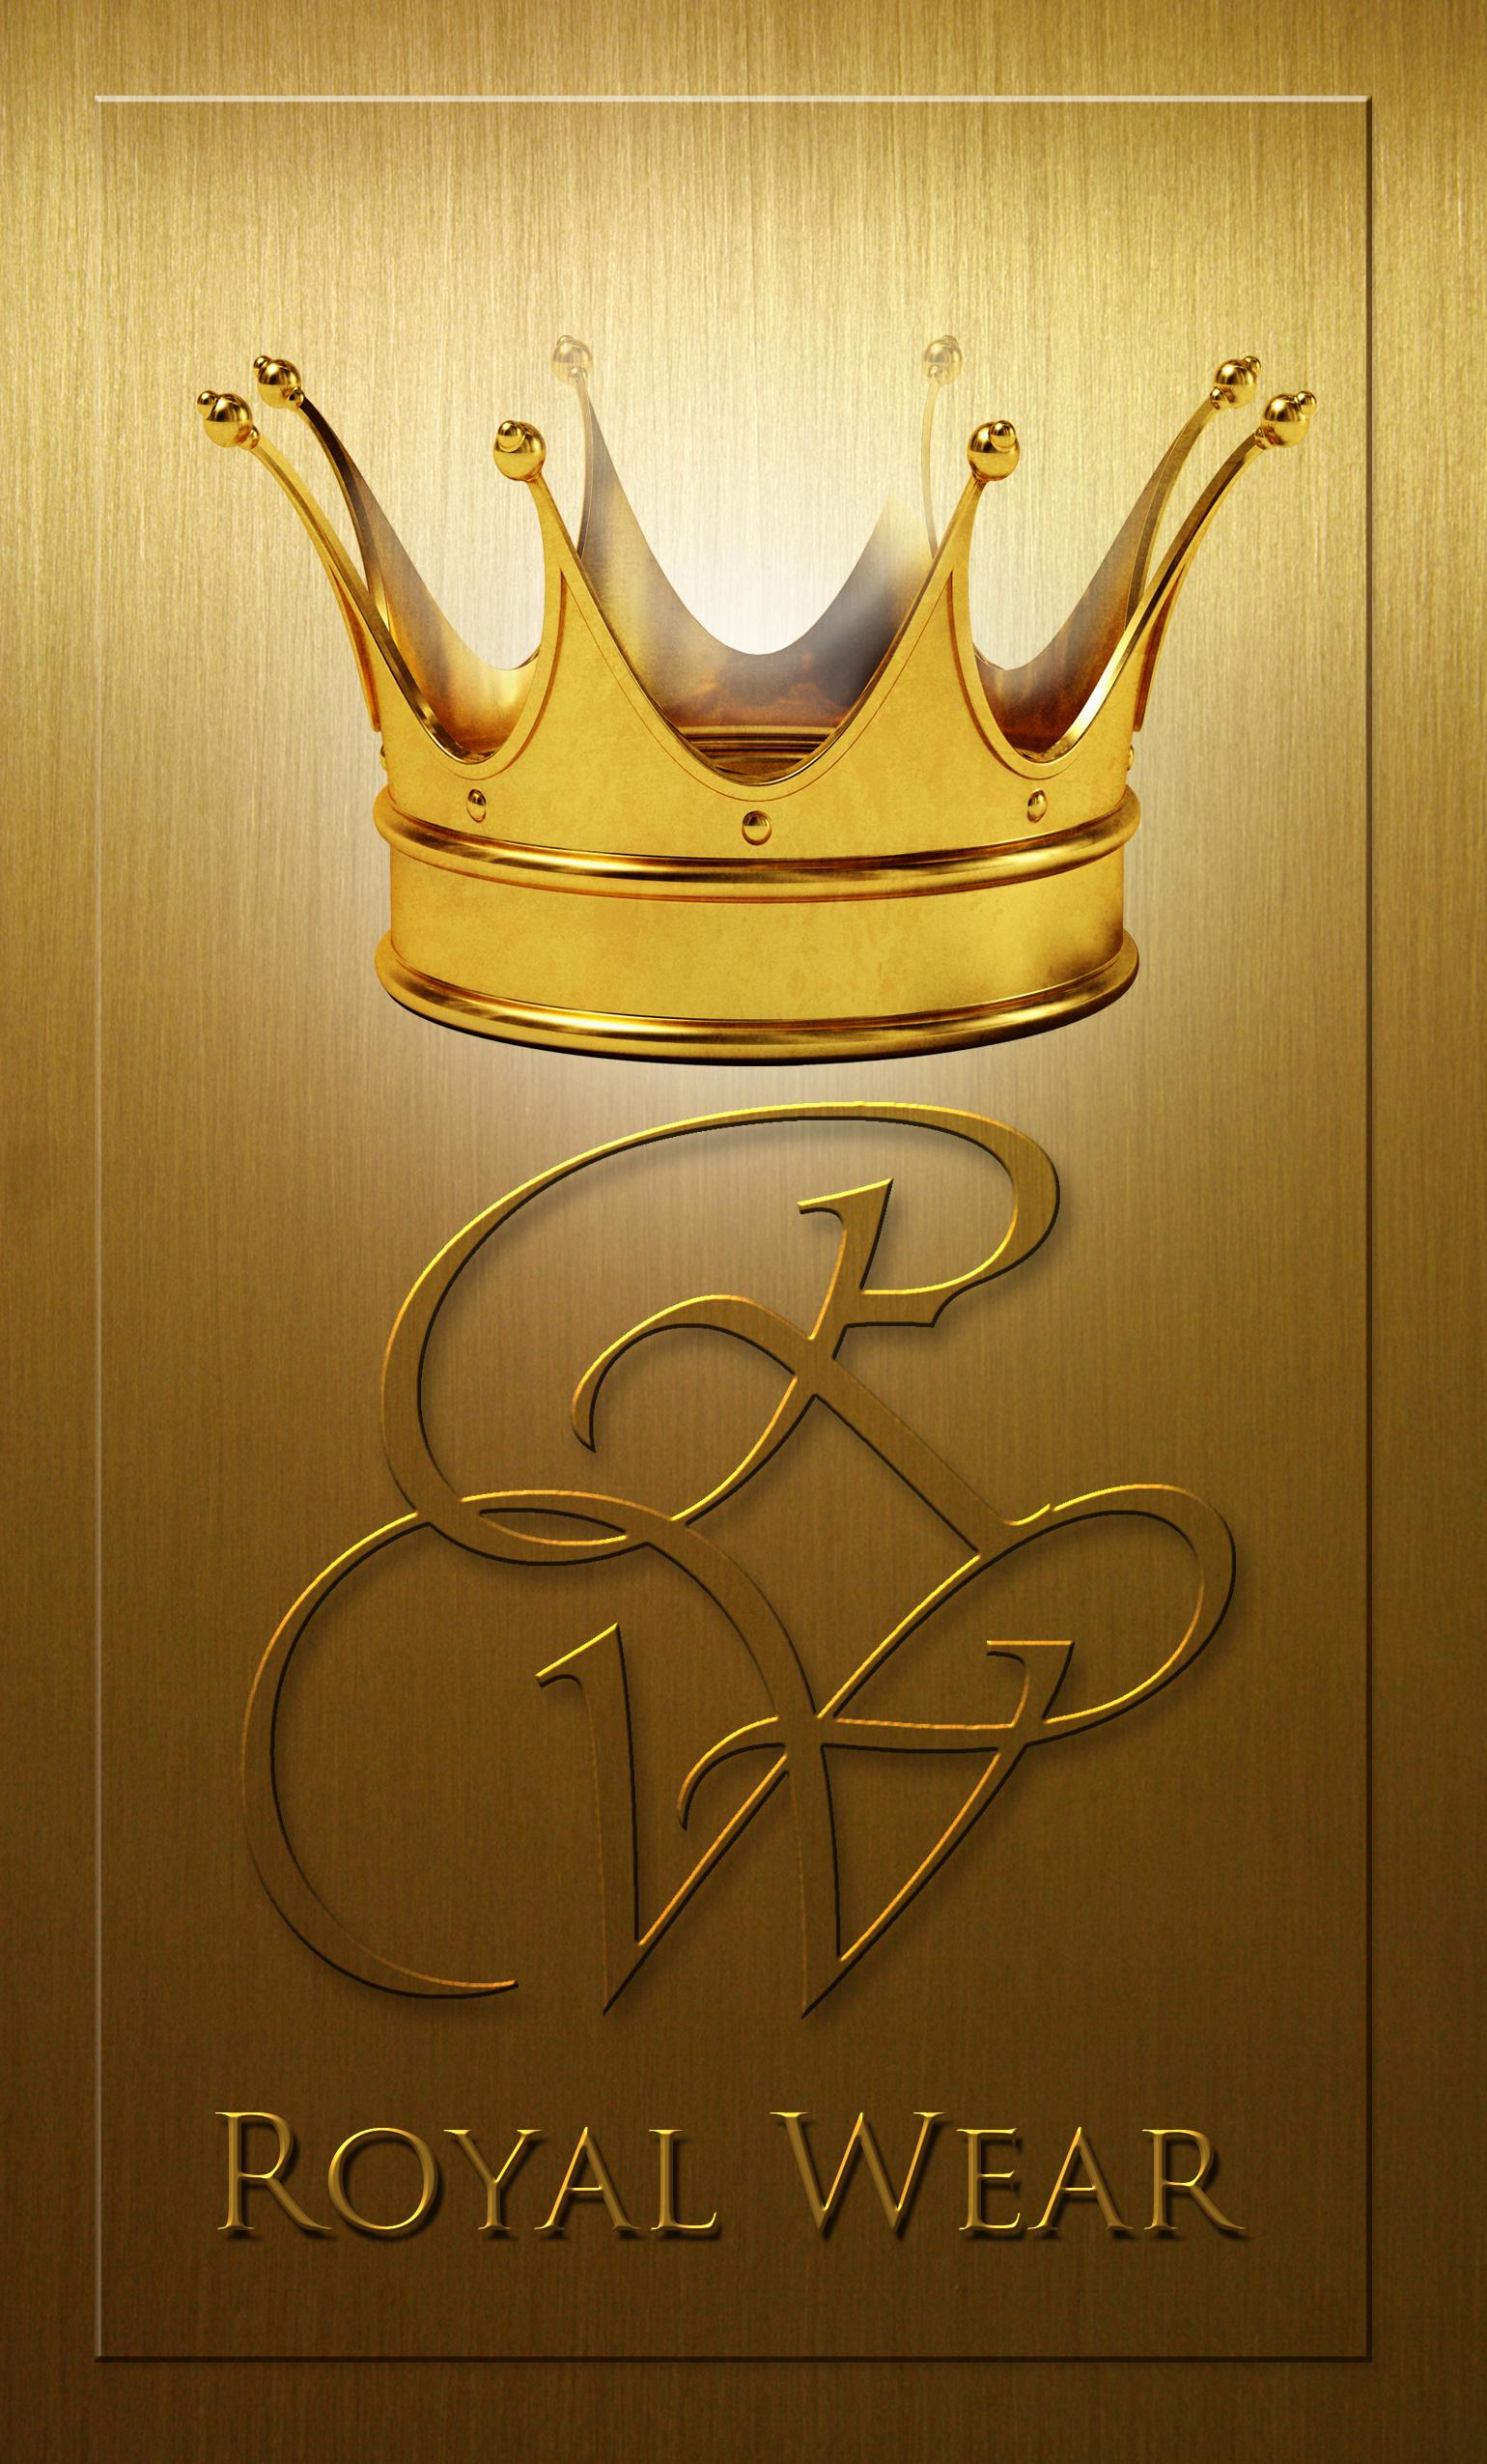 Royal Wear Gold Final .jpg